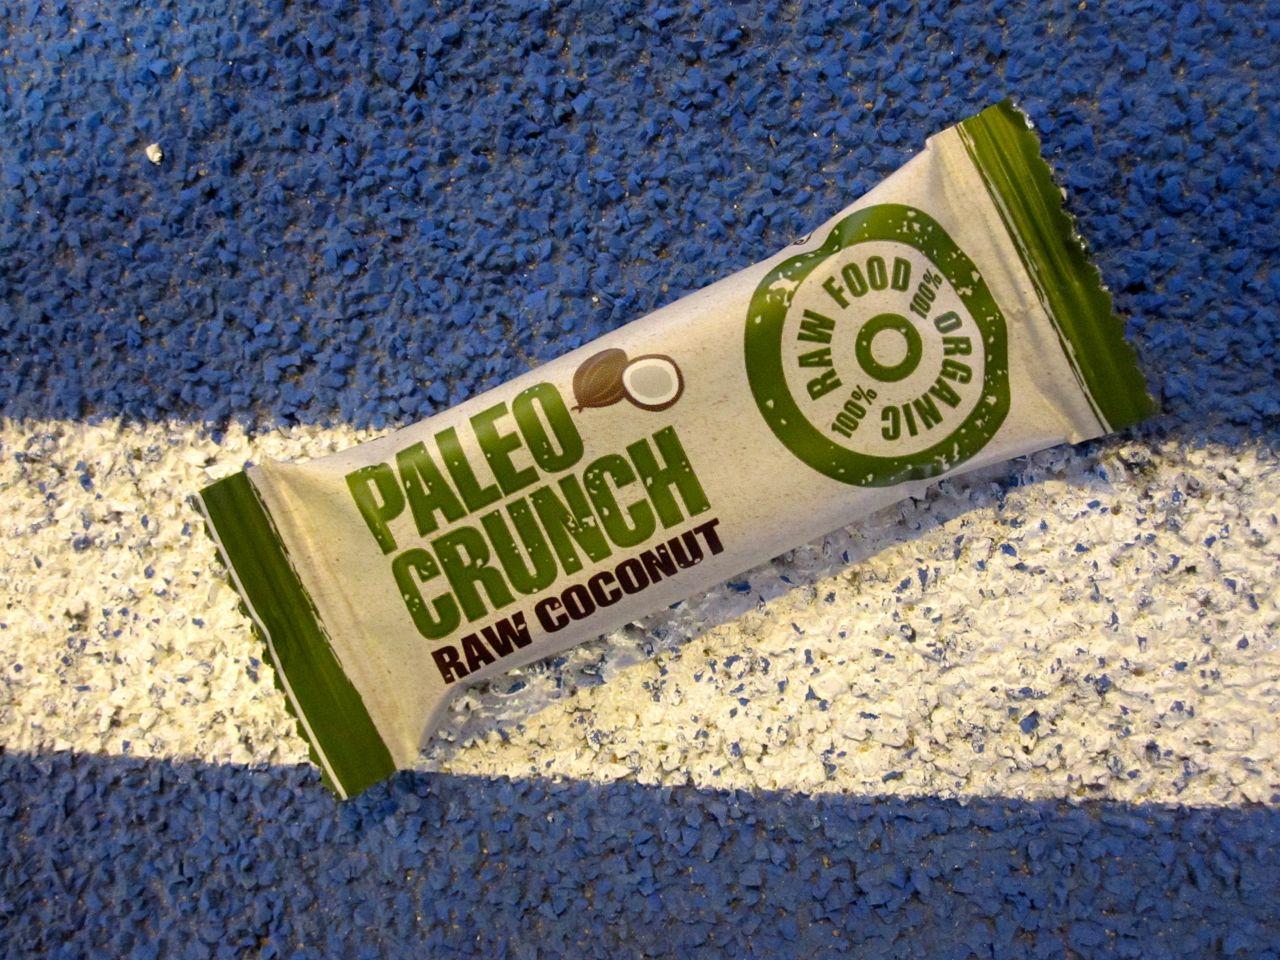 Paleo crunch